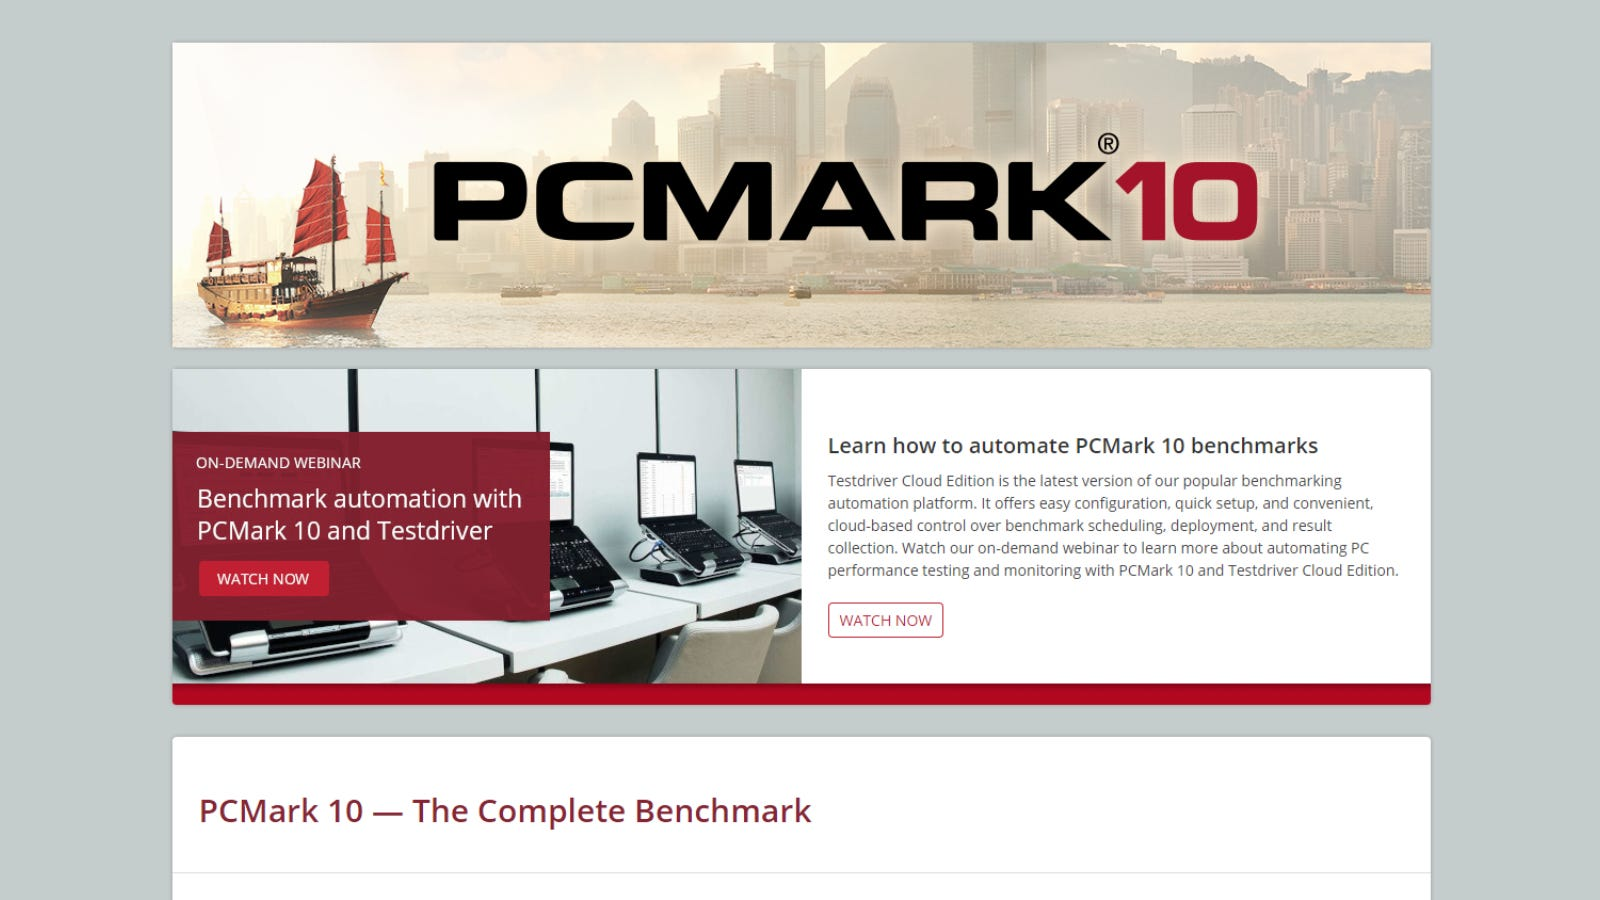 PCMark 10 website homepage